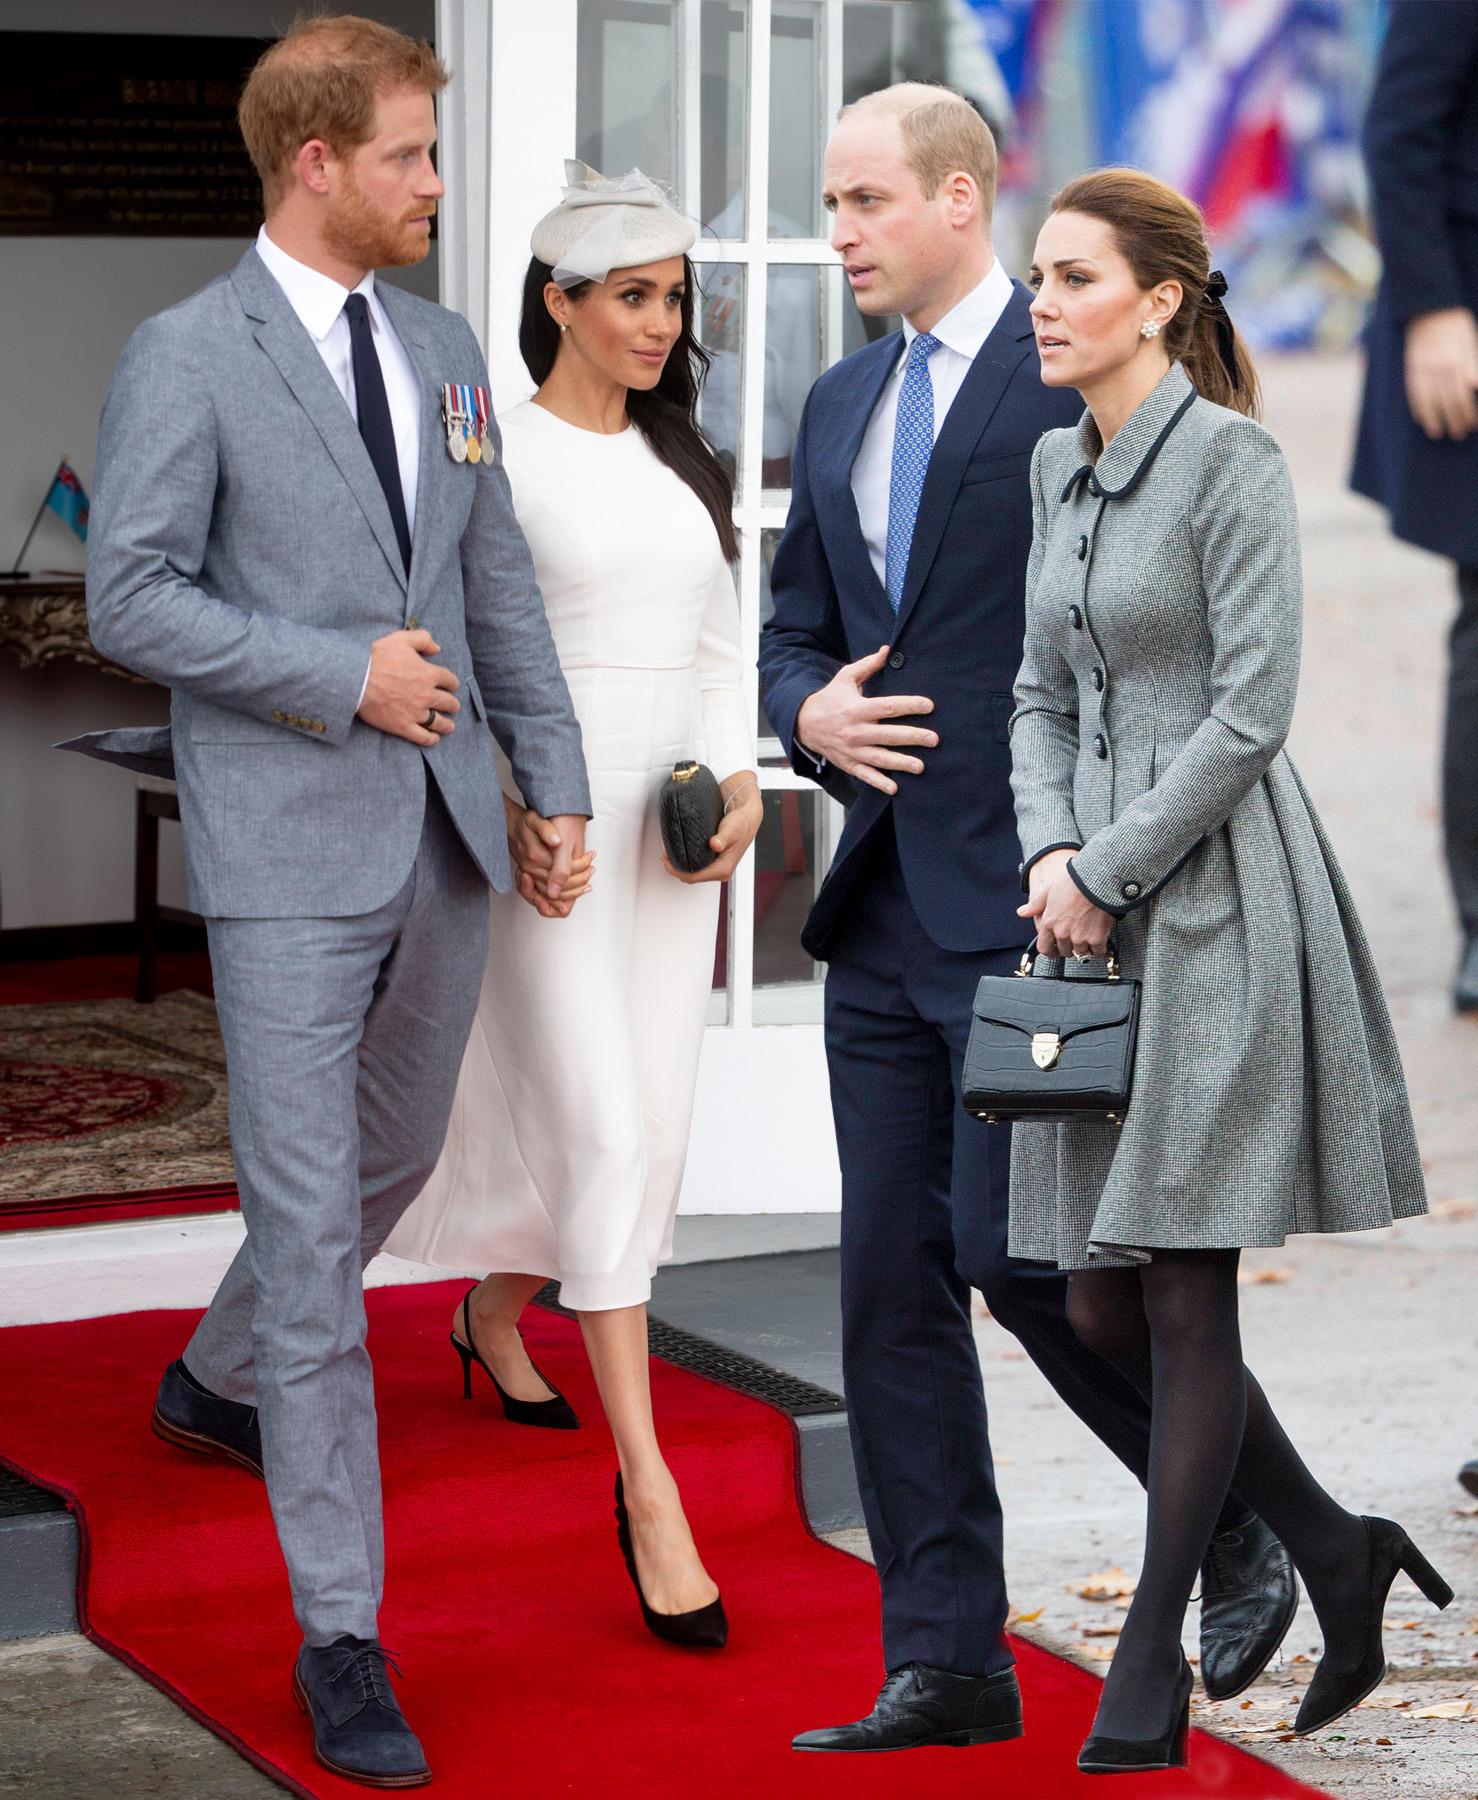 Prinz Harry, Herzogin Meghan, Prinz William und Herzogin Meghan